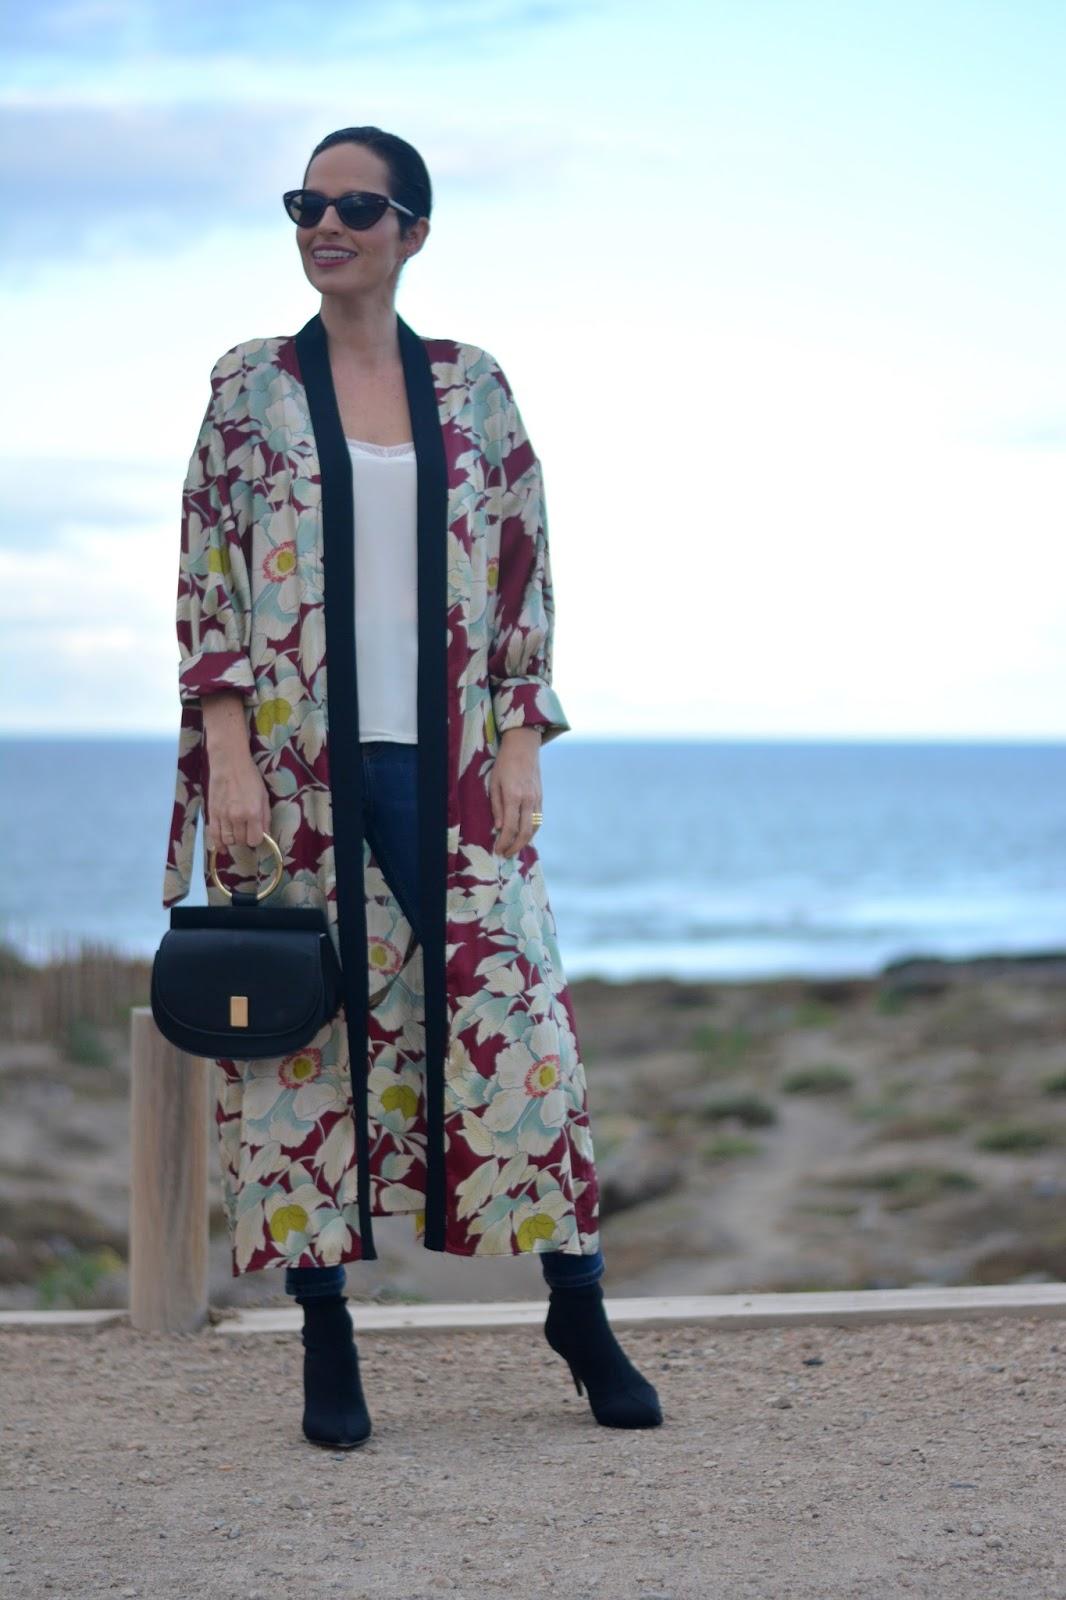 zara-kimono-outfit-daily-looks-gema-betancor